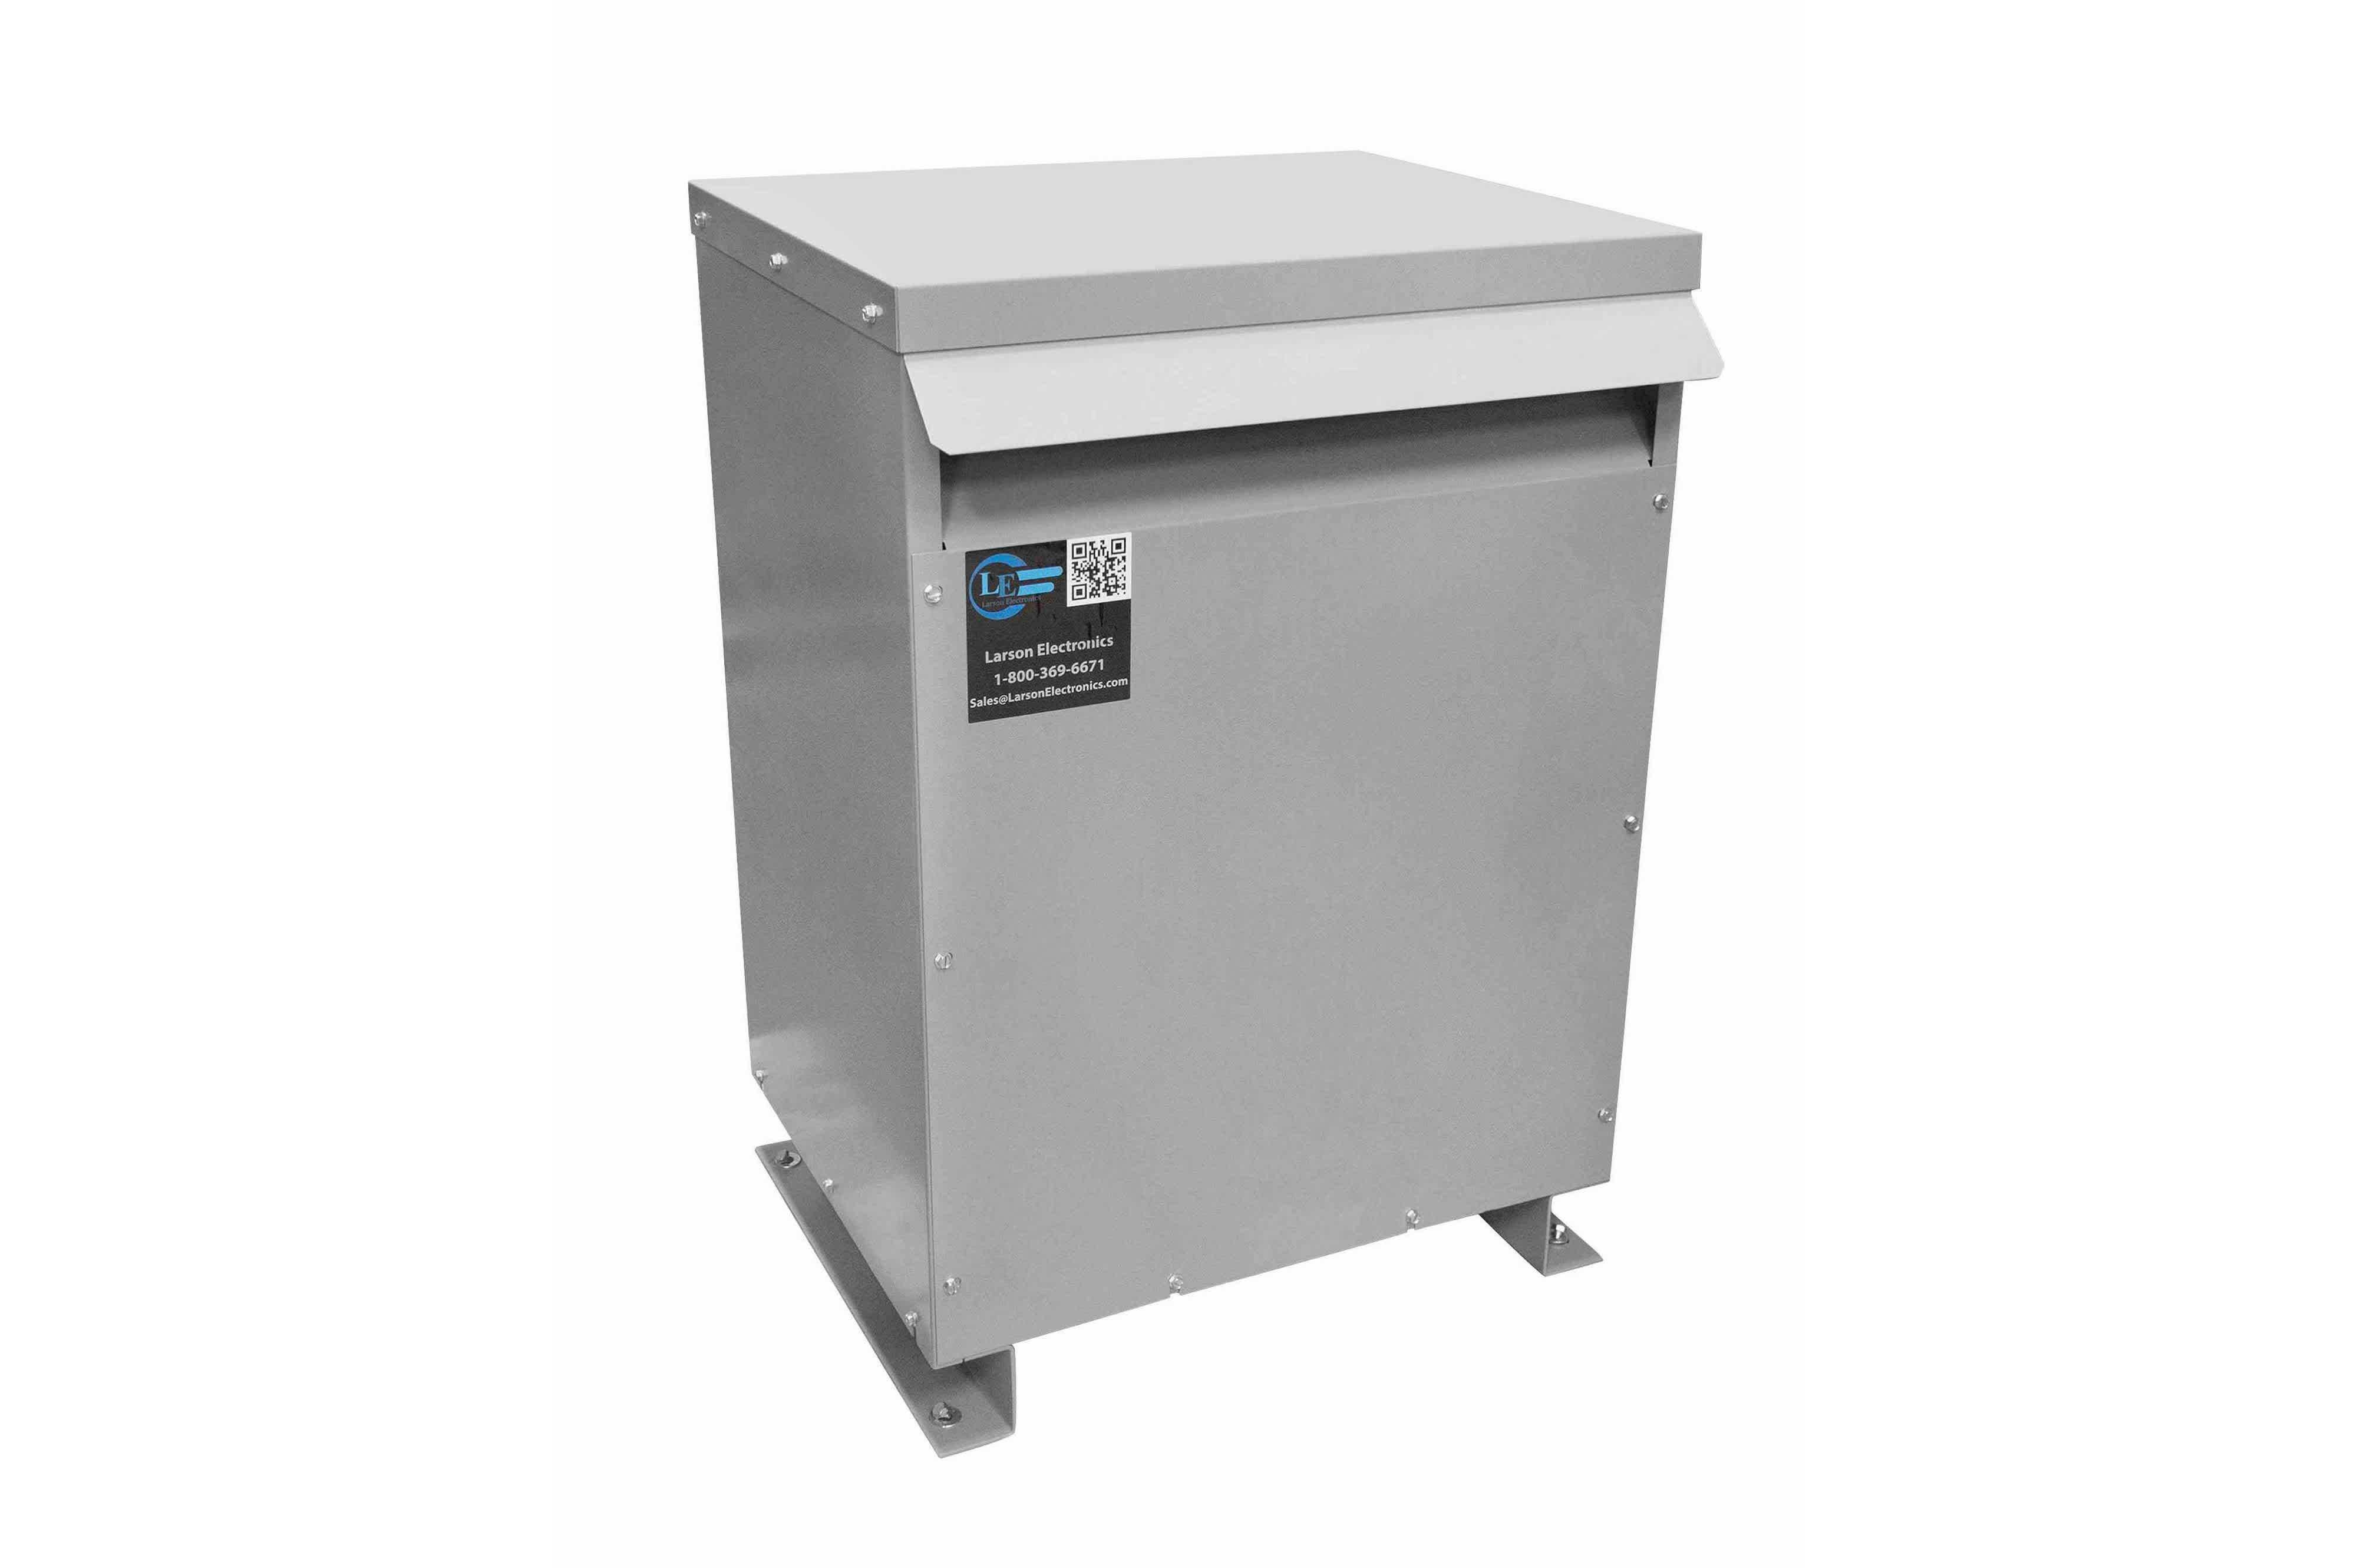 11 kVA 3PH Isolation Transformer, 240V Wye Primary, 380Y/220 Wye-N Secondary, N3R, Ventilated, 60 Hz